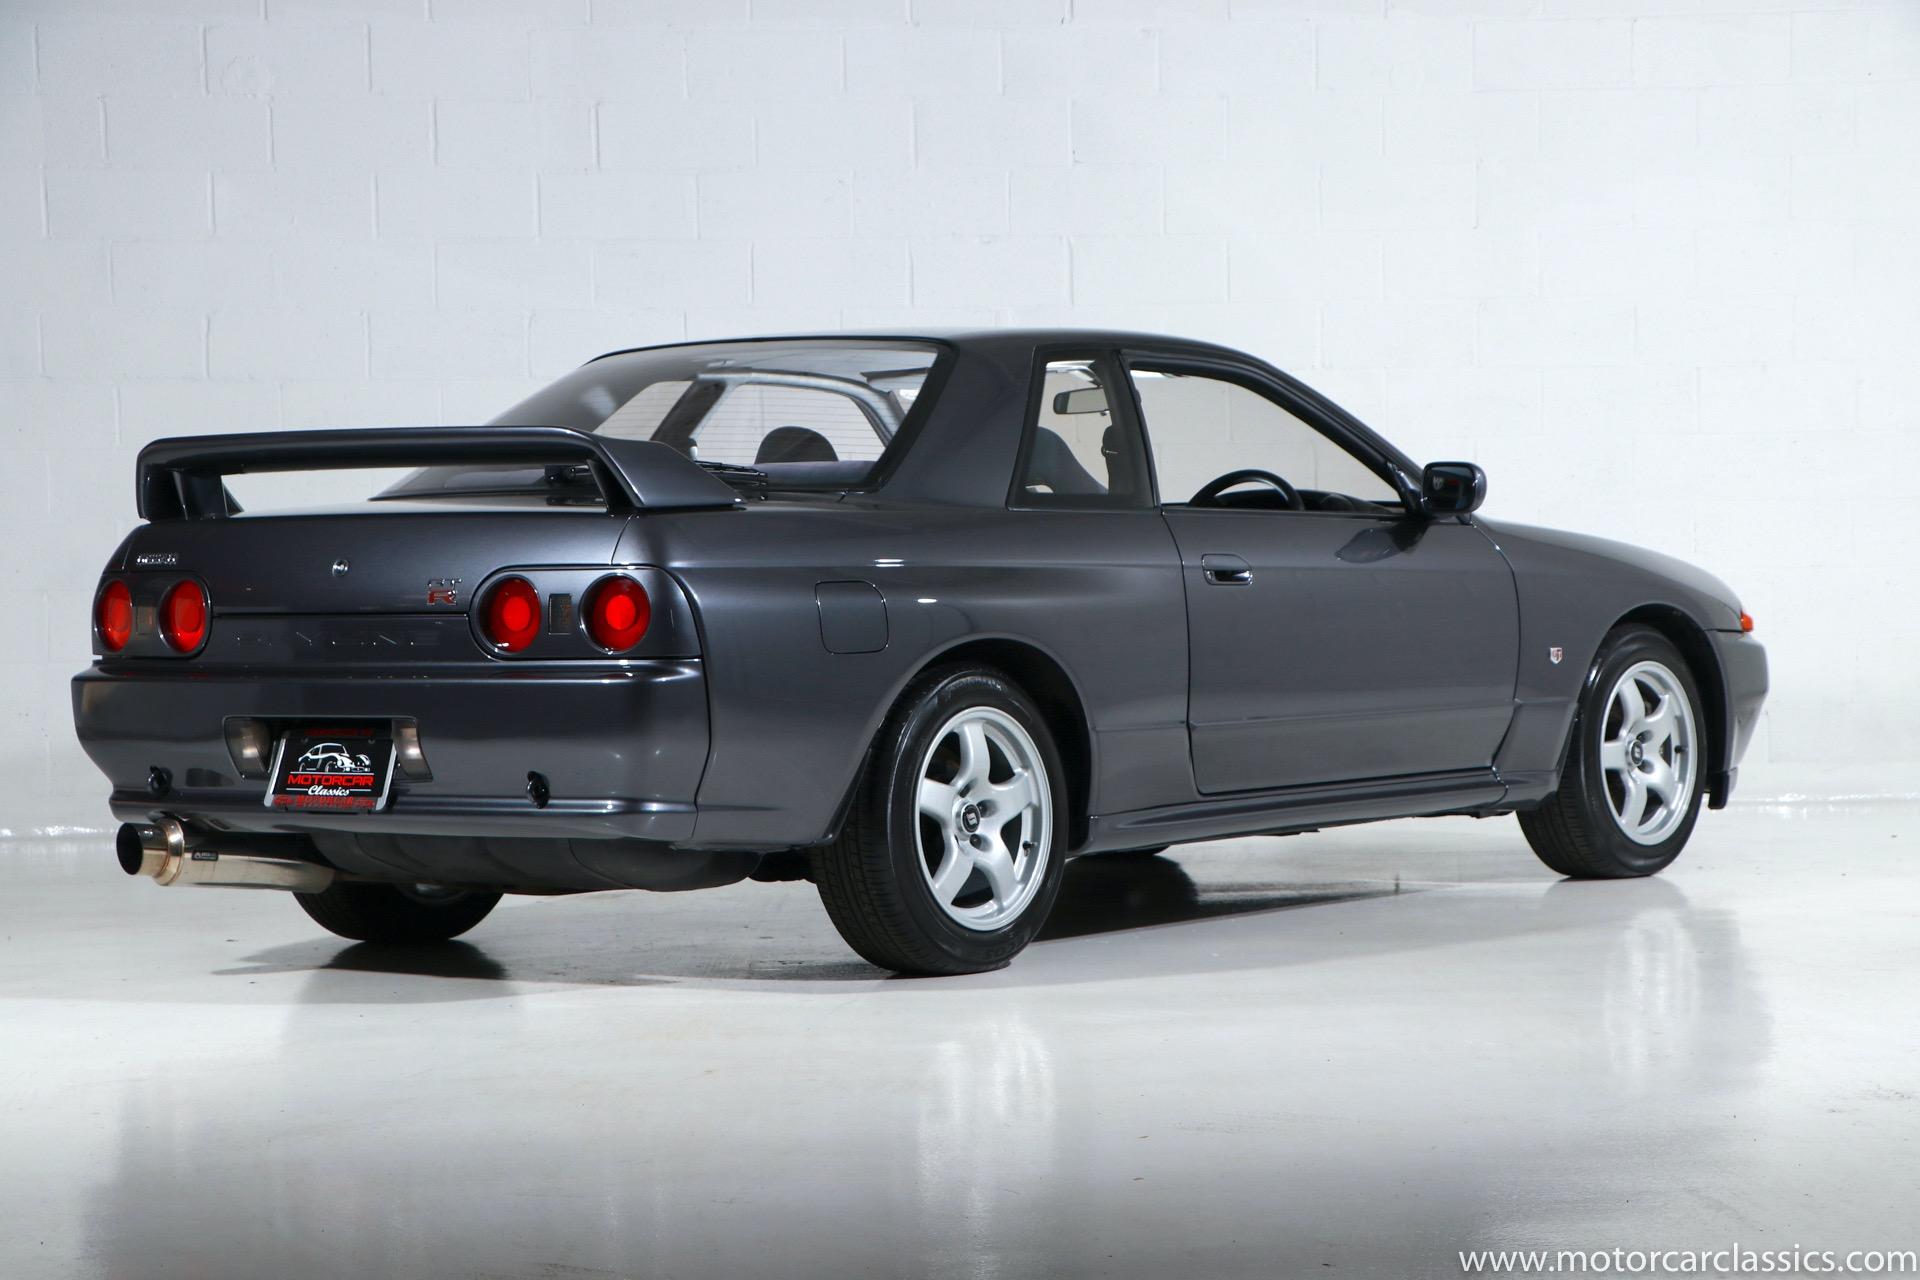 1989 Nissan Skyline GTR